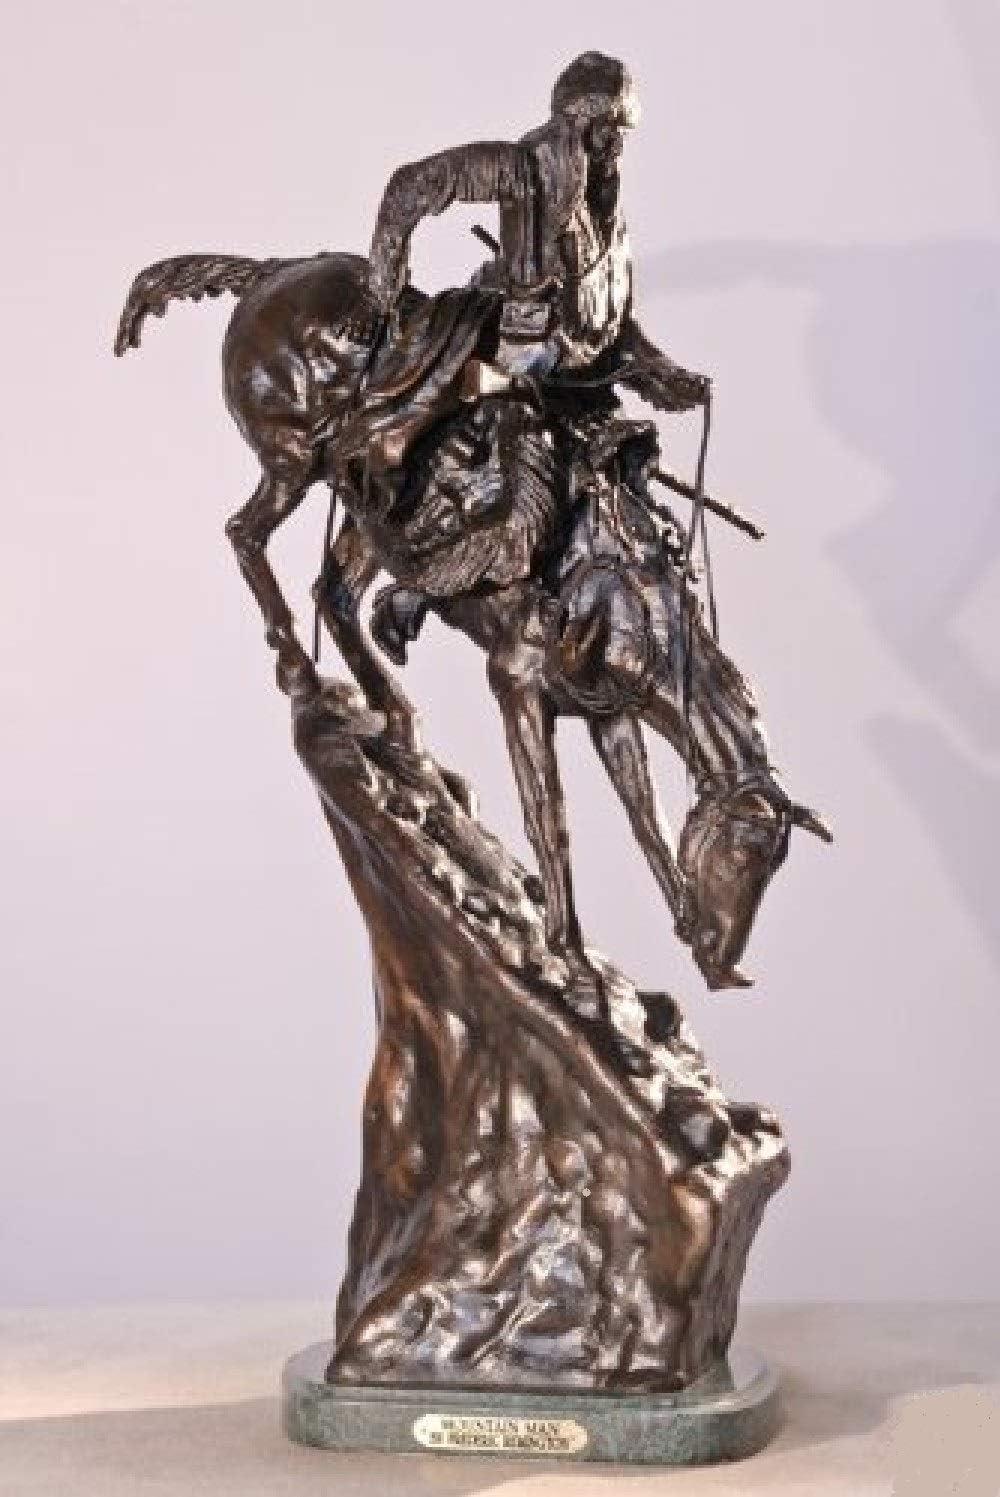 Artistic Solutions Frederic Remington Lost Wax Bronze Sculpture Mountain Man Statue – Medium Size